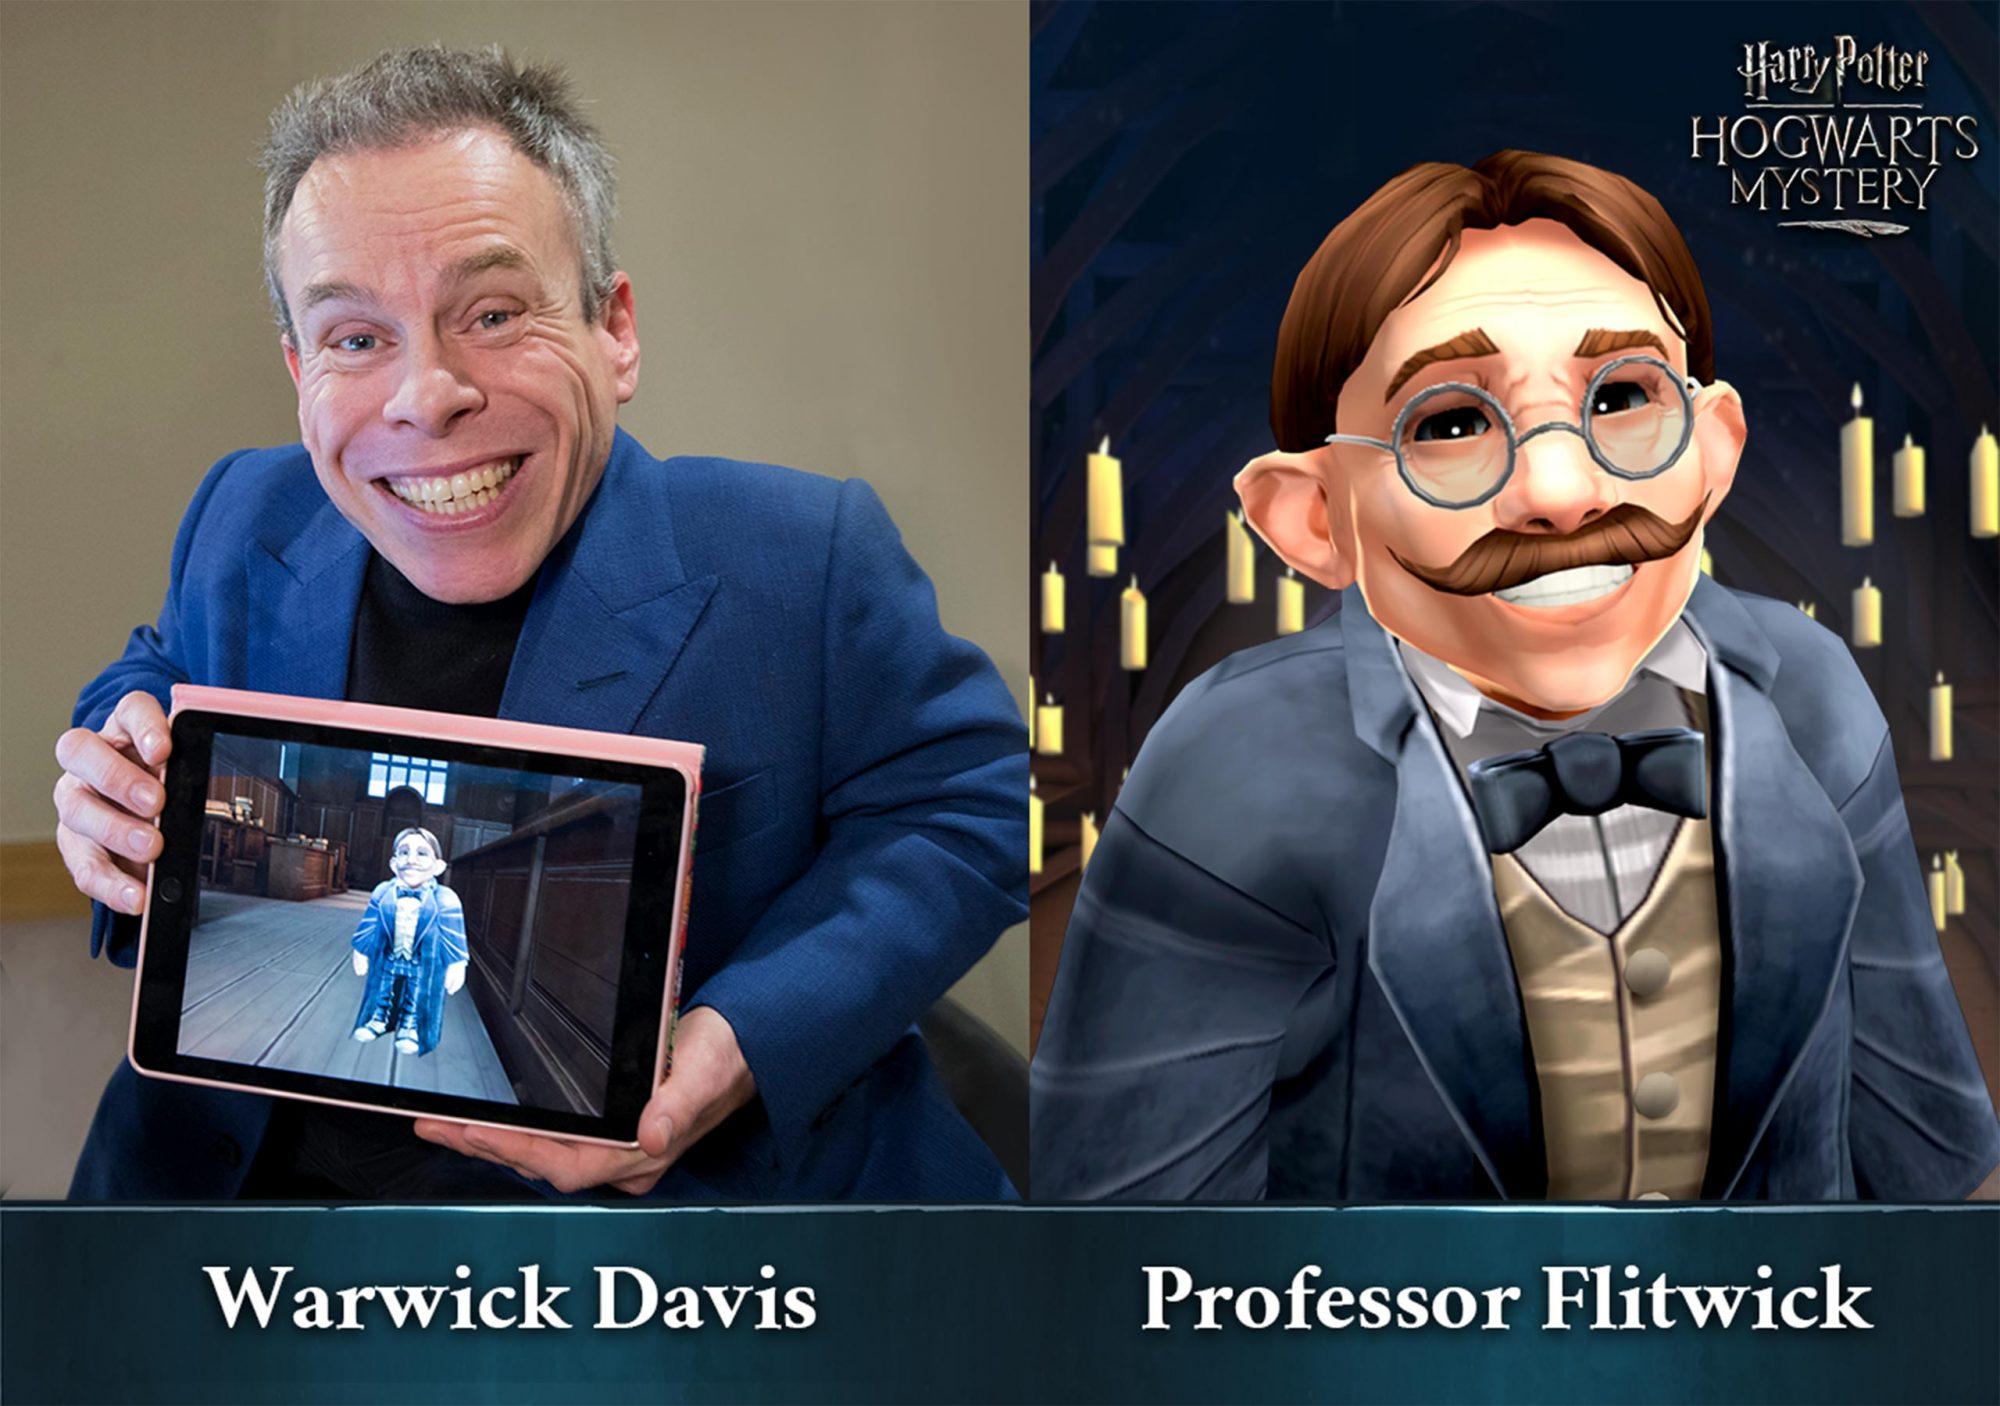 HP_Press_WarwickDavis_Flitwick_02